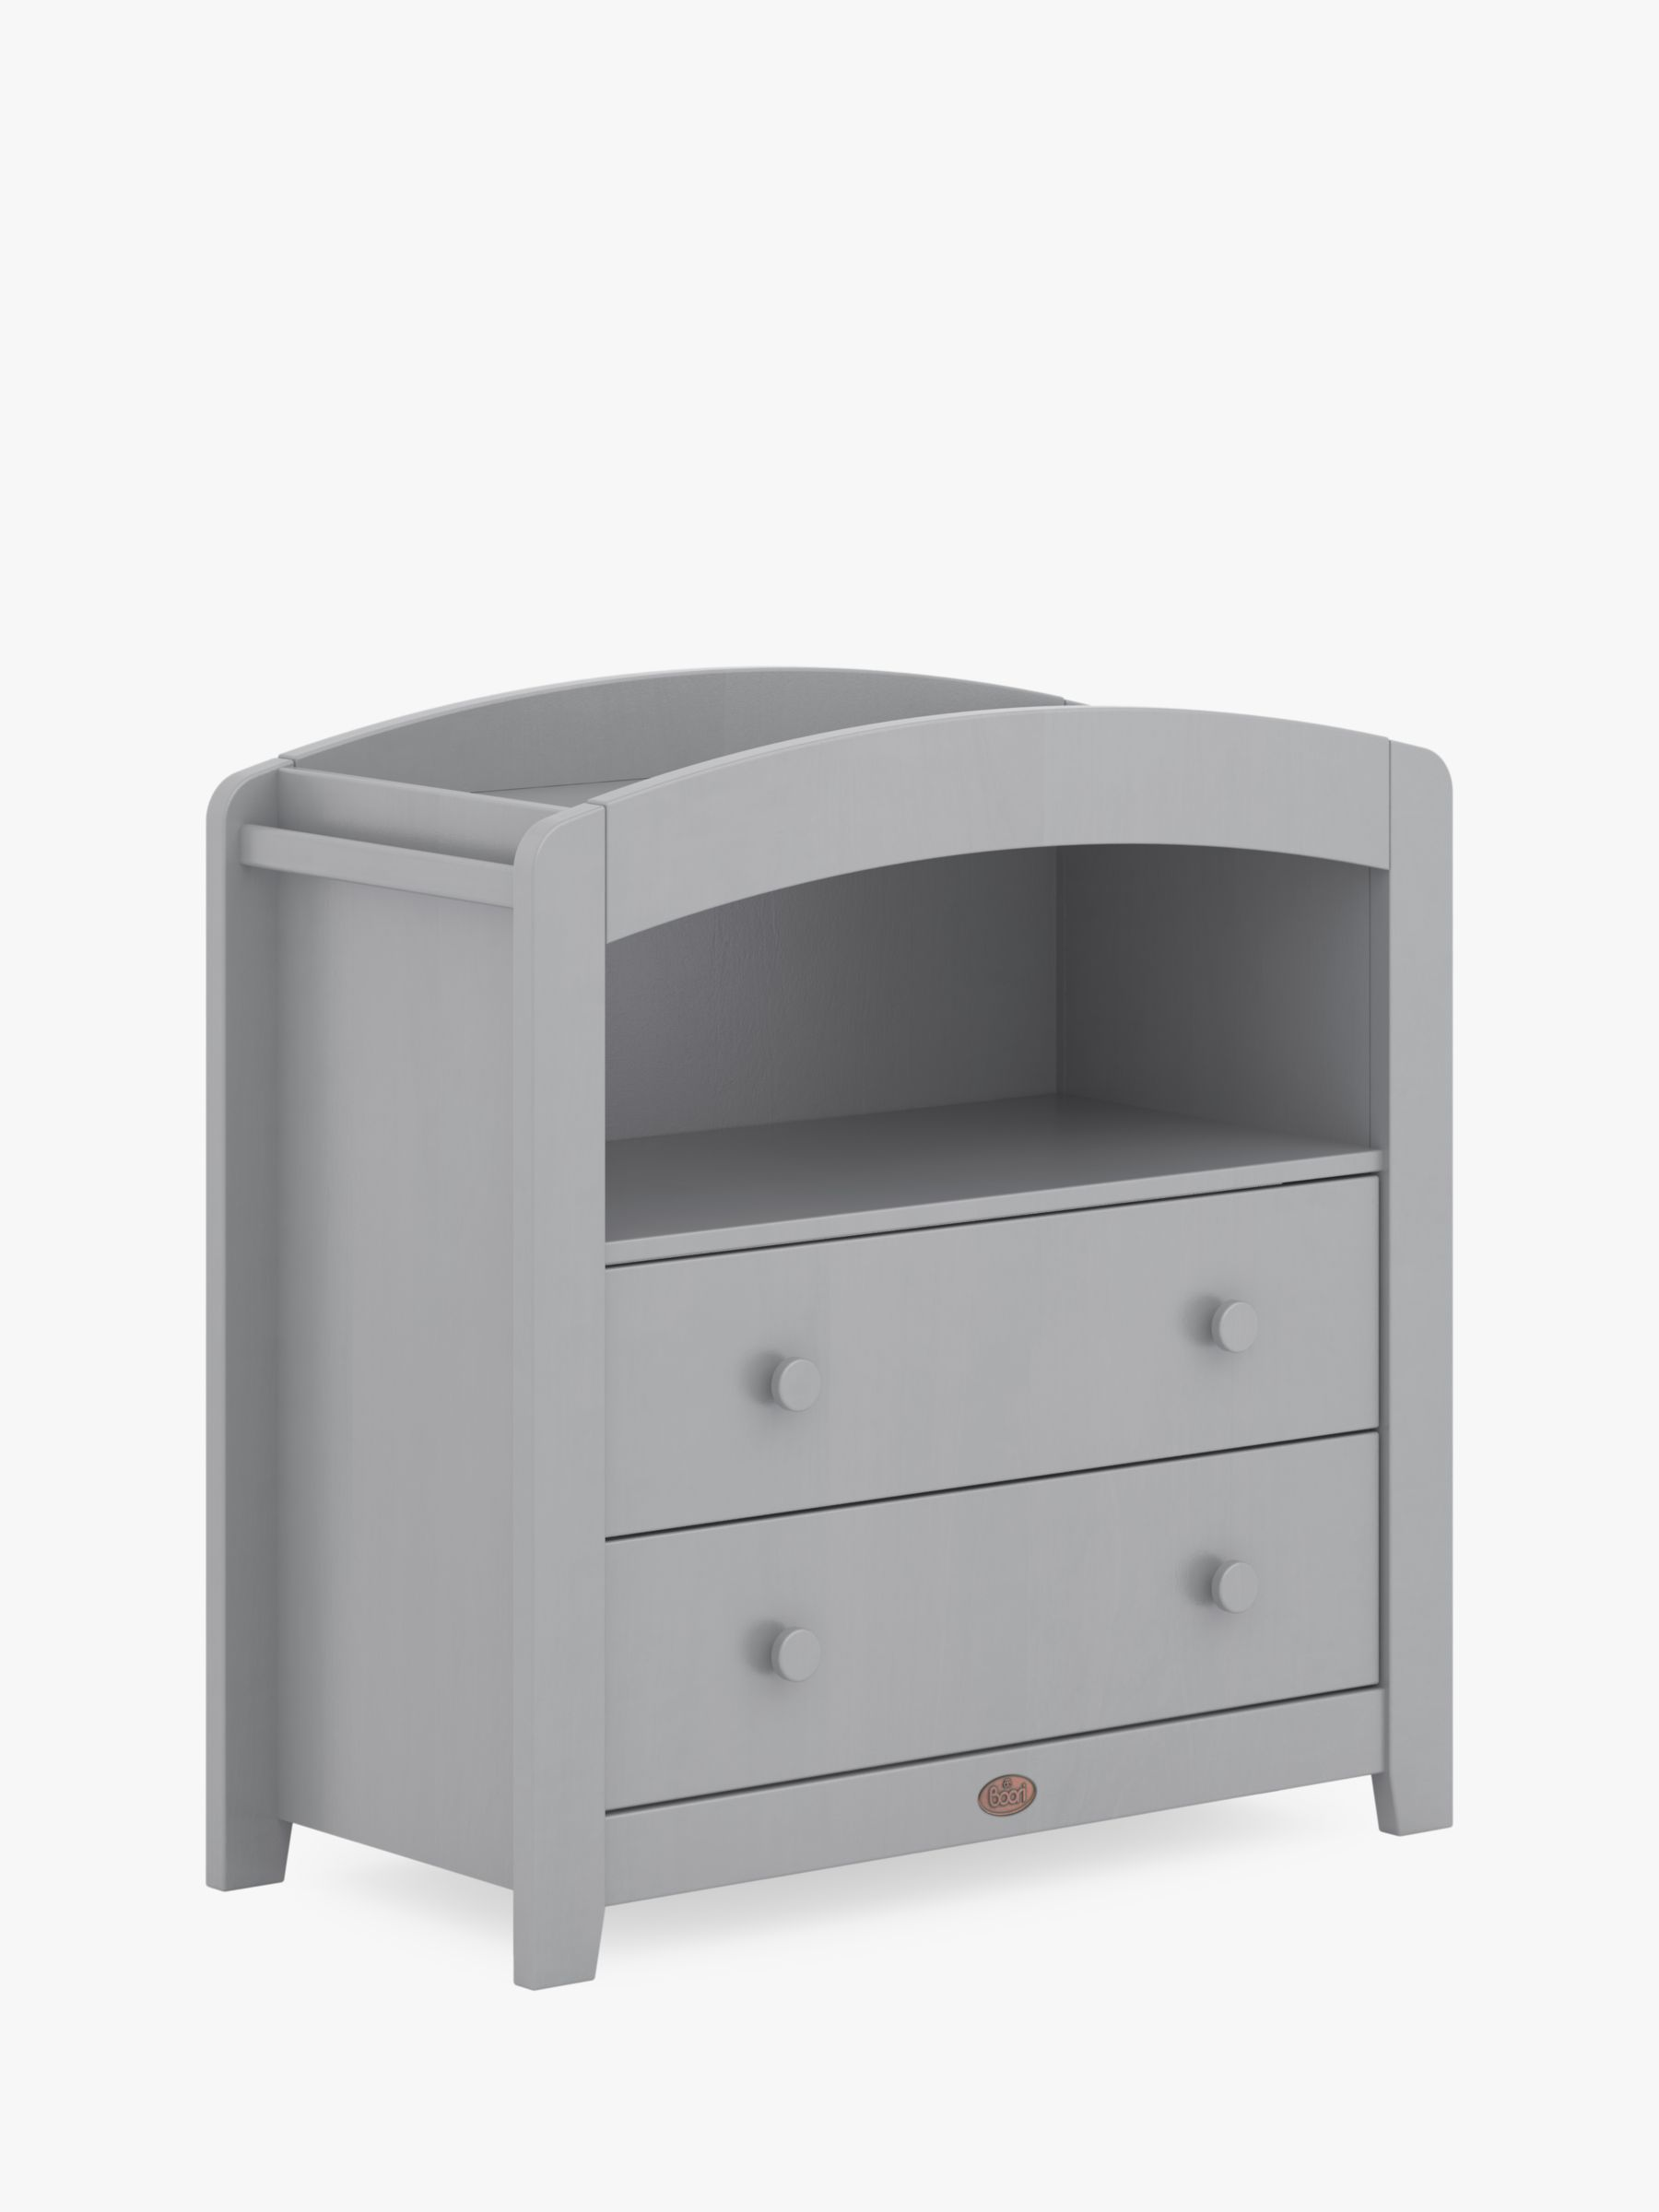 Boori Boori Alice Curved 2 Drawer Dresser, Pebble